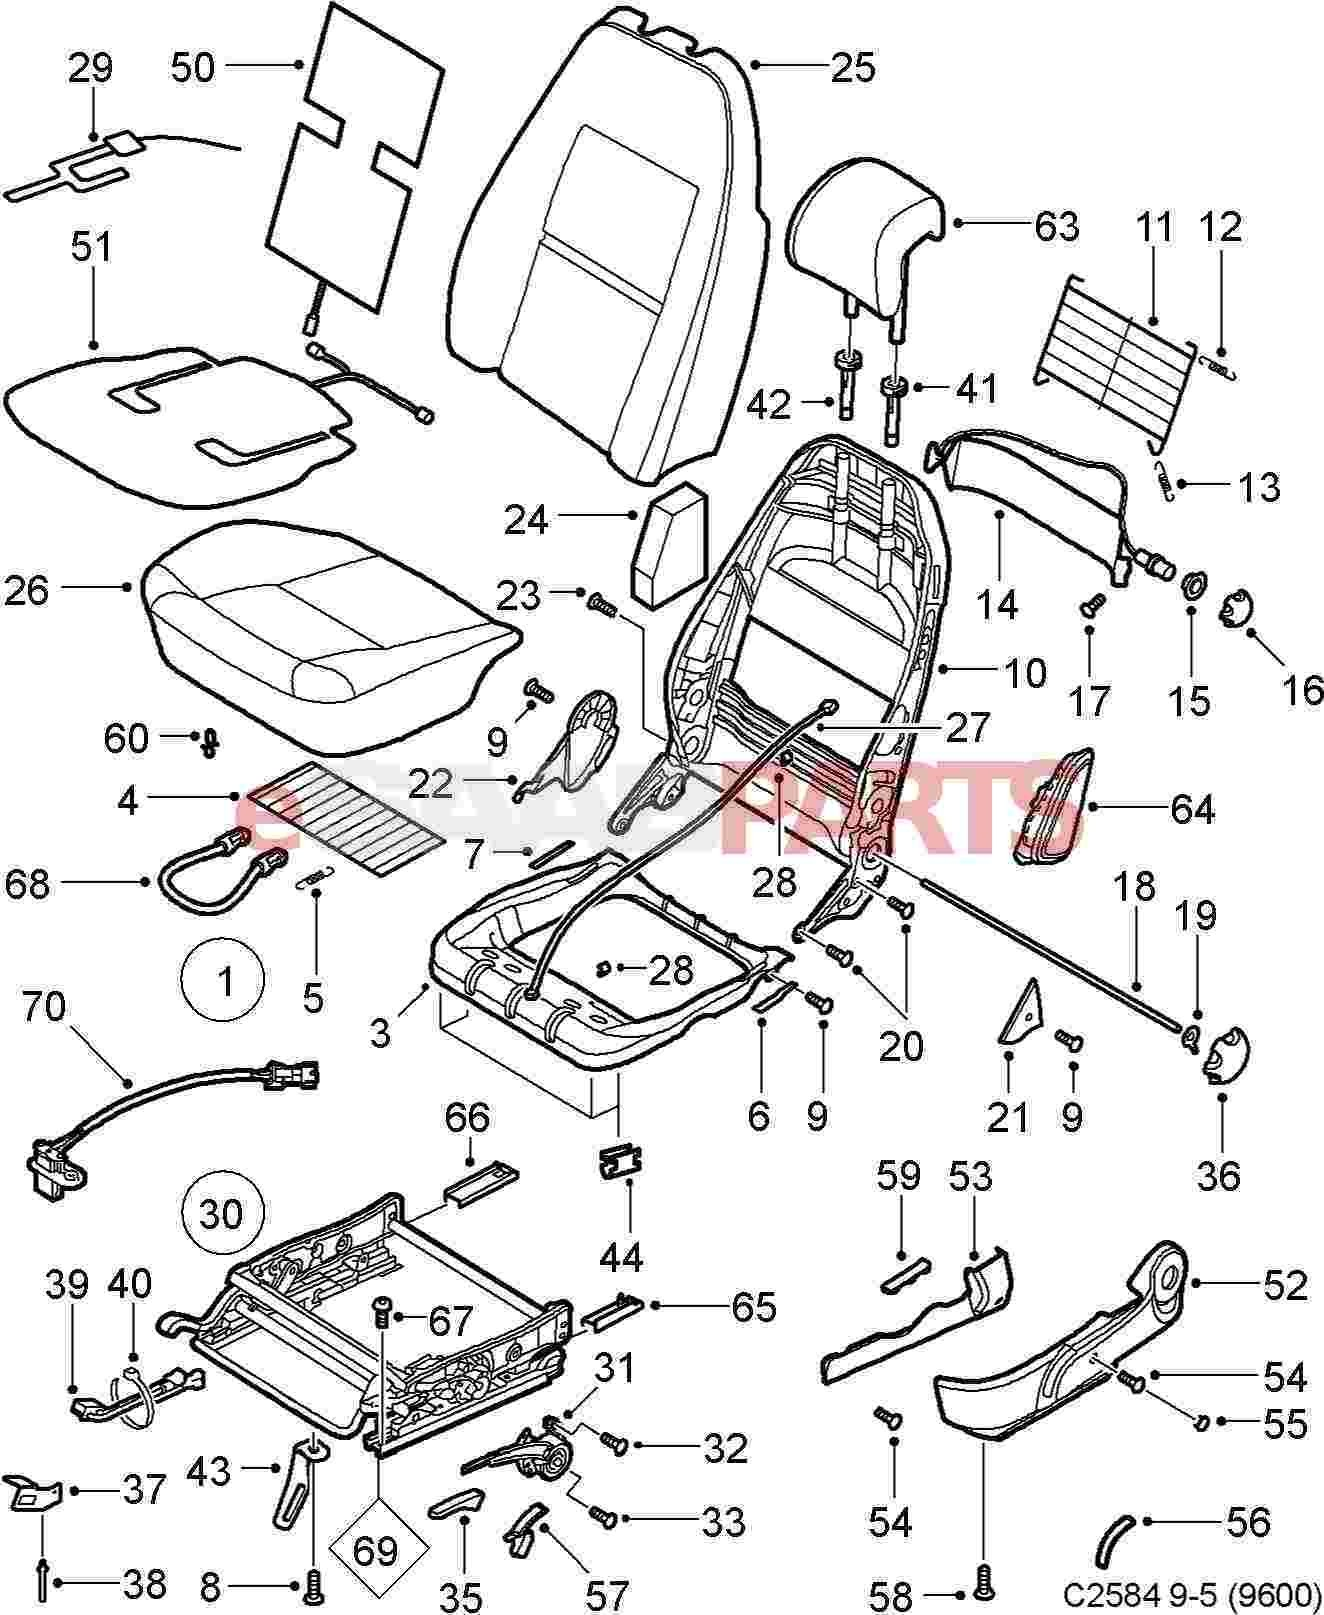 Seat Belt assembly Diagram Esaabparts Of Seat Belt assembly Diagram